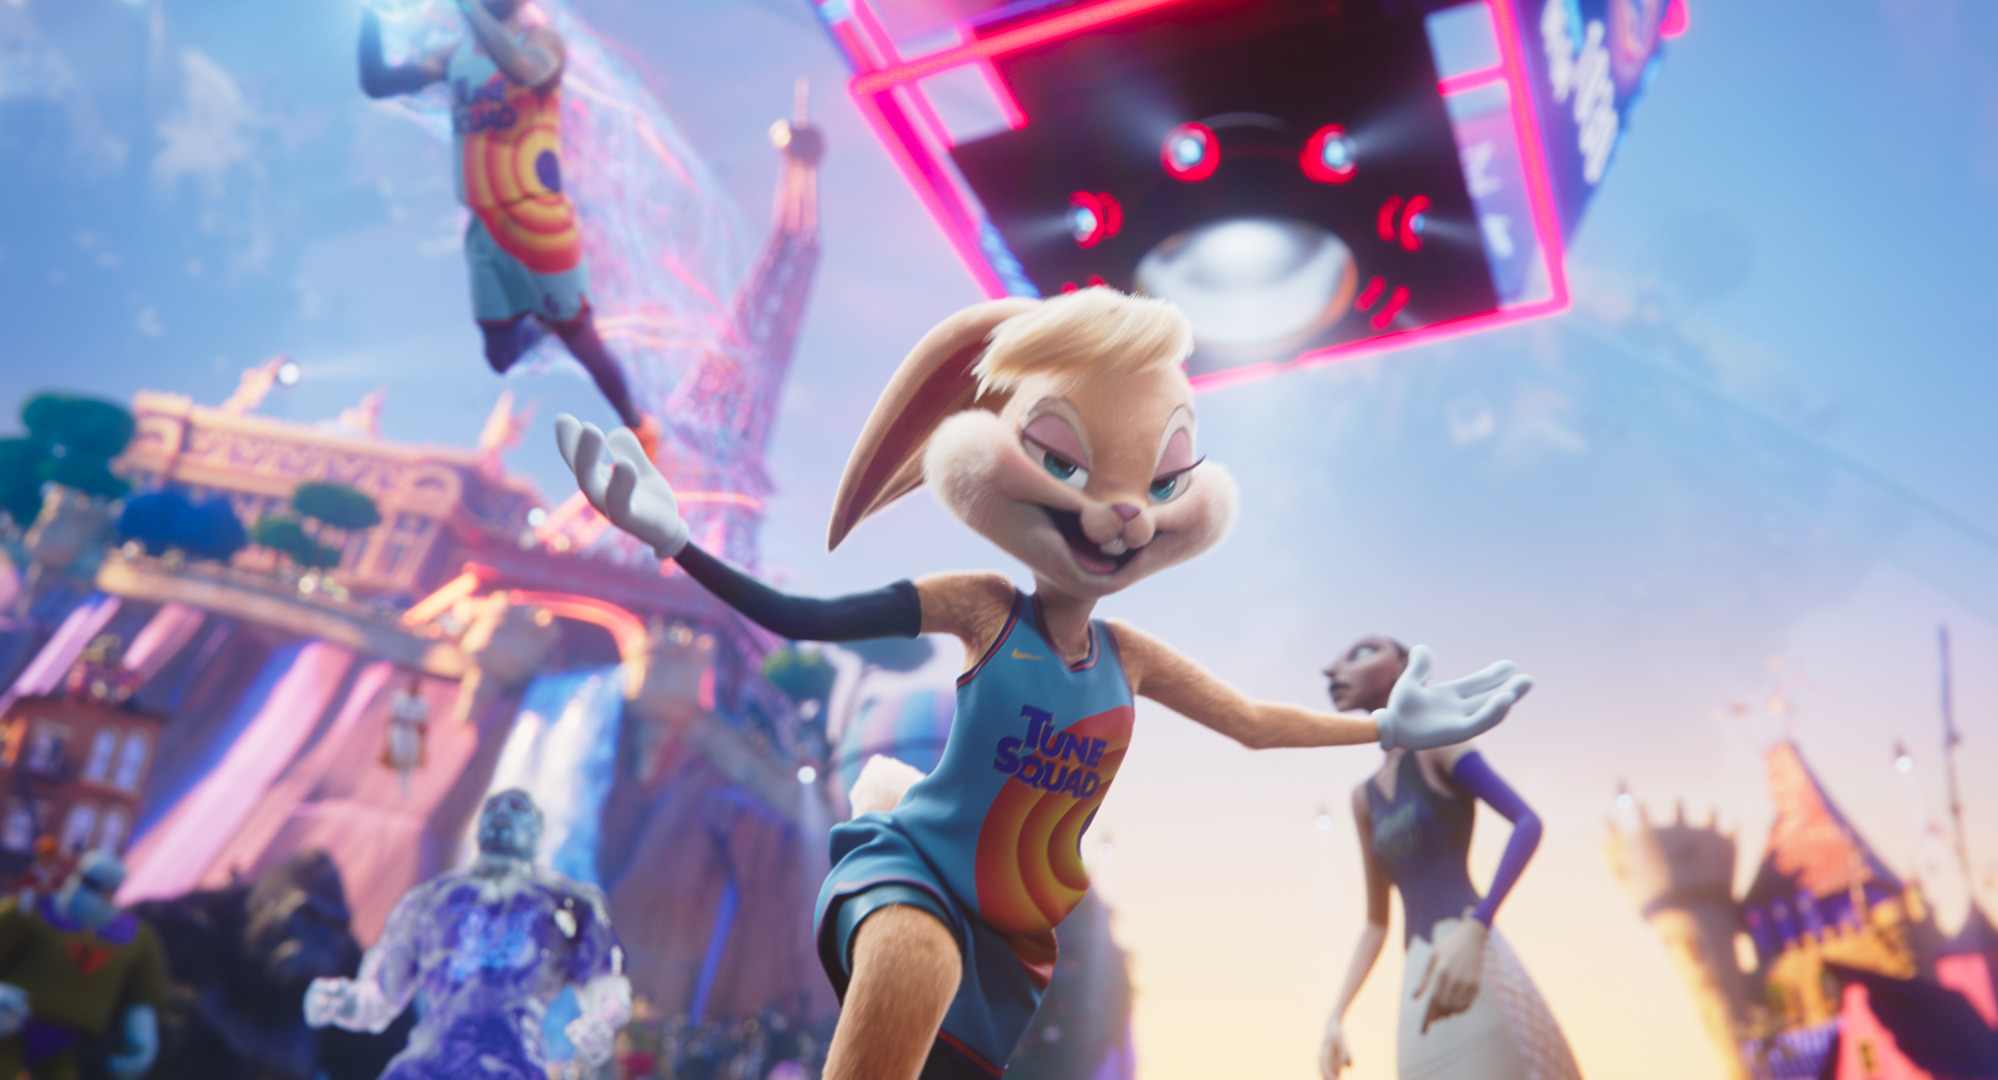 Lola Bunny Space Jam 2